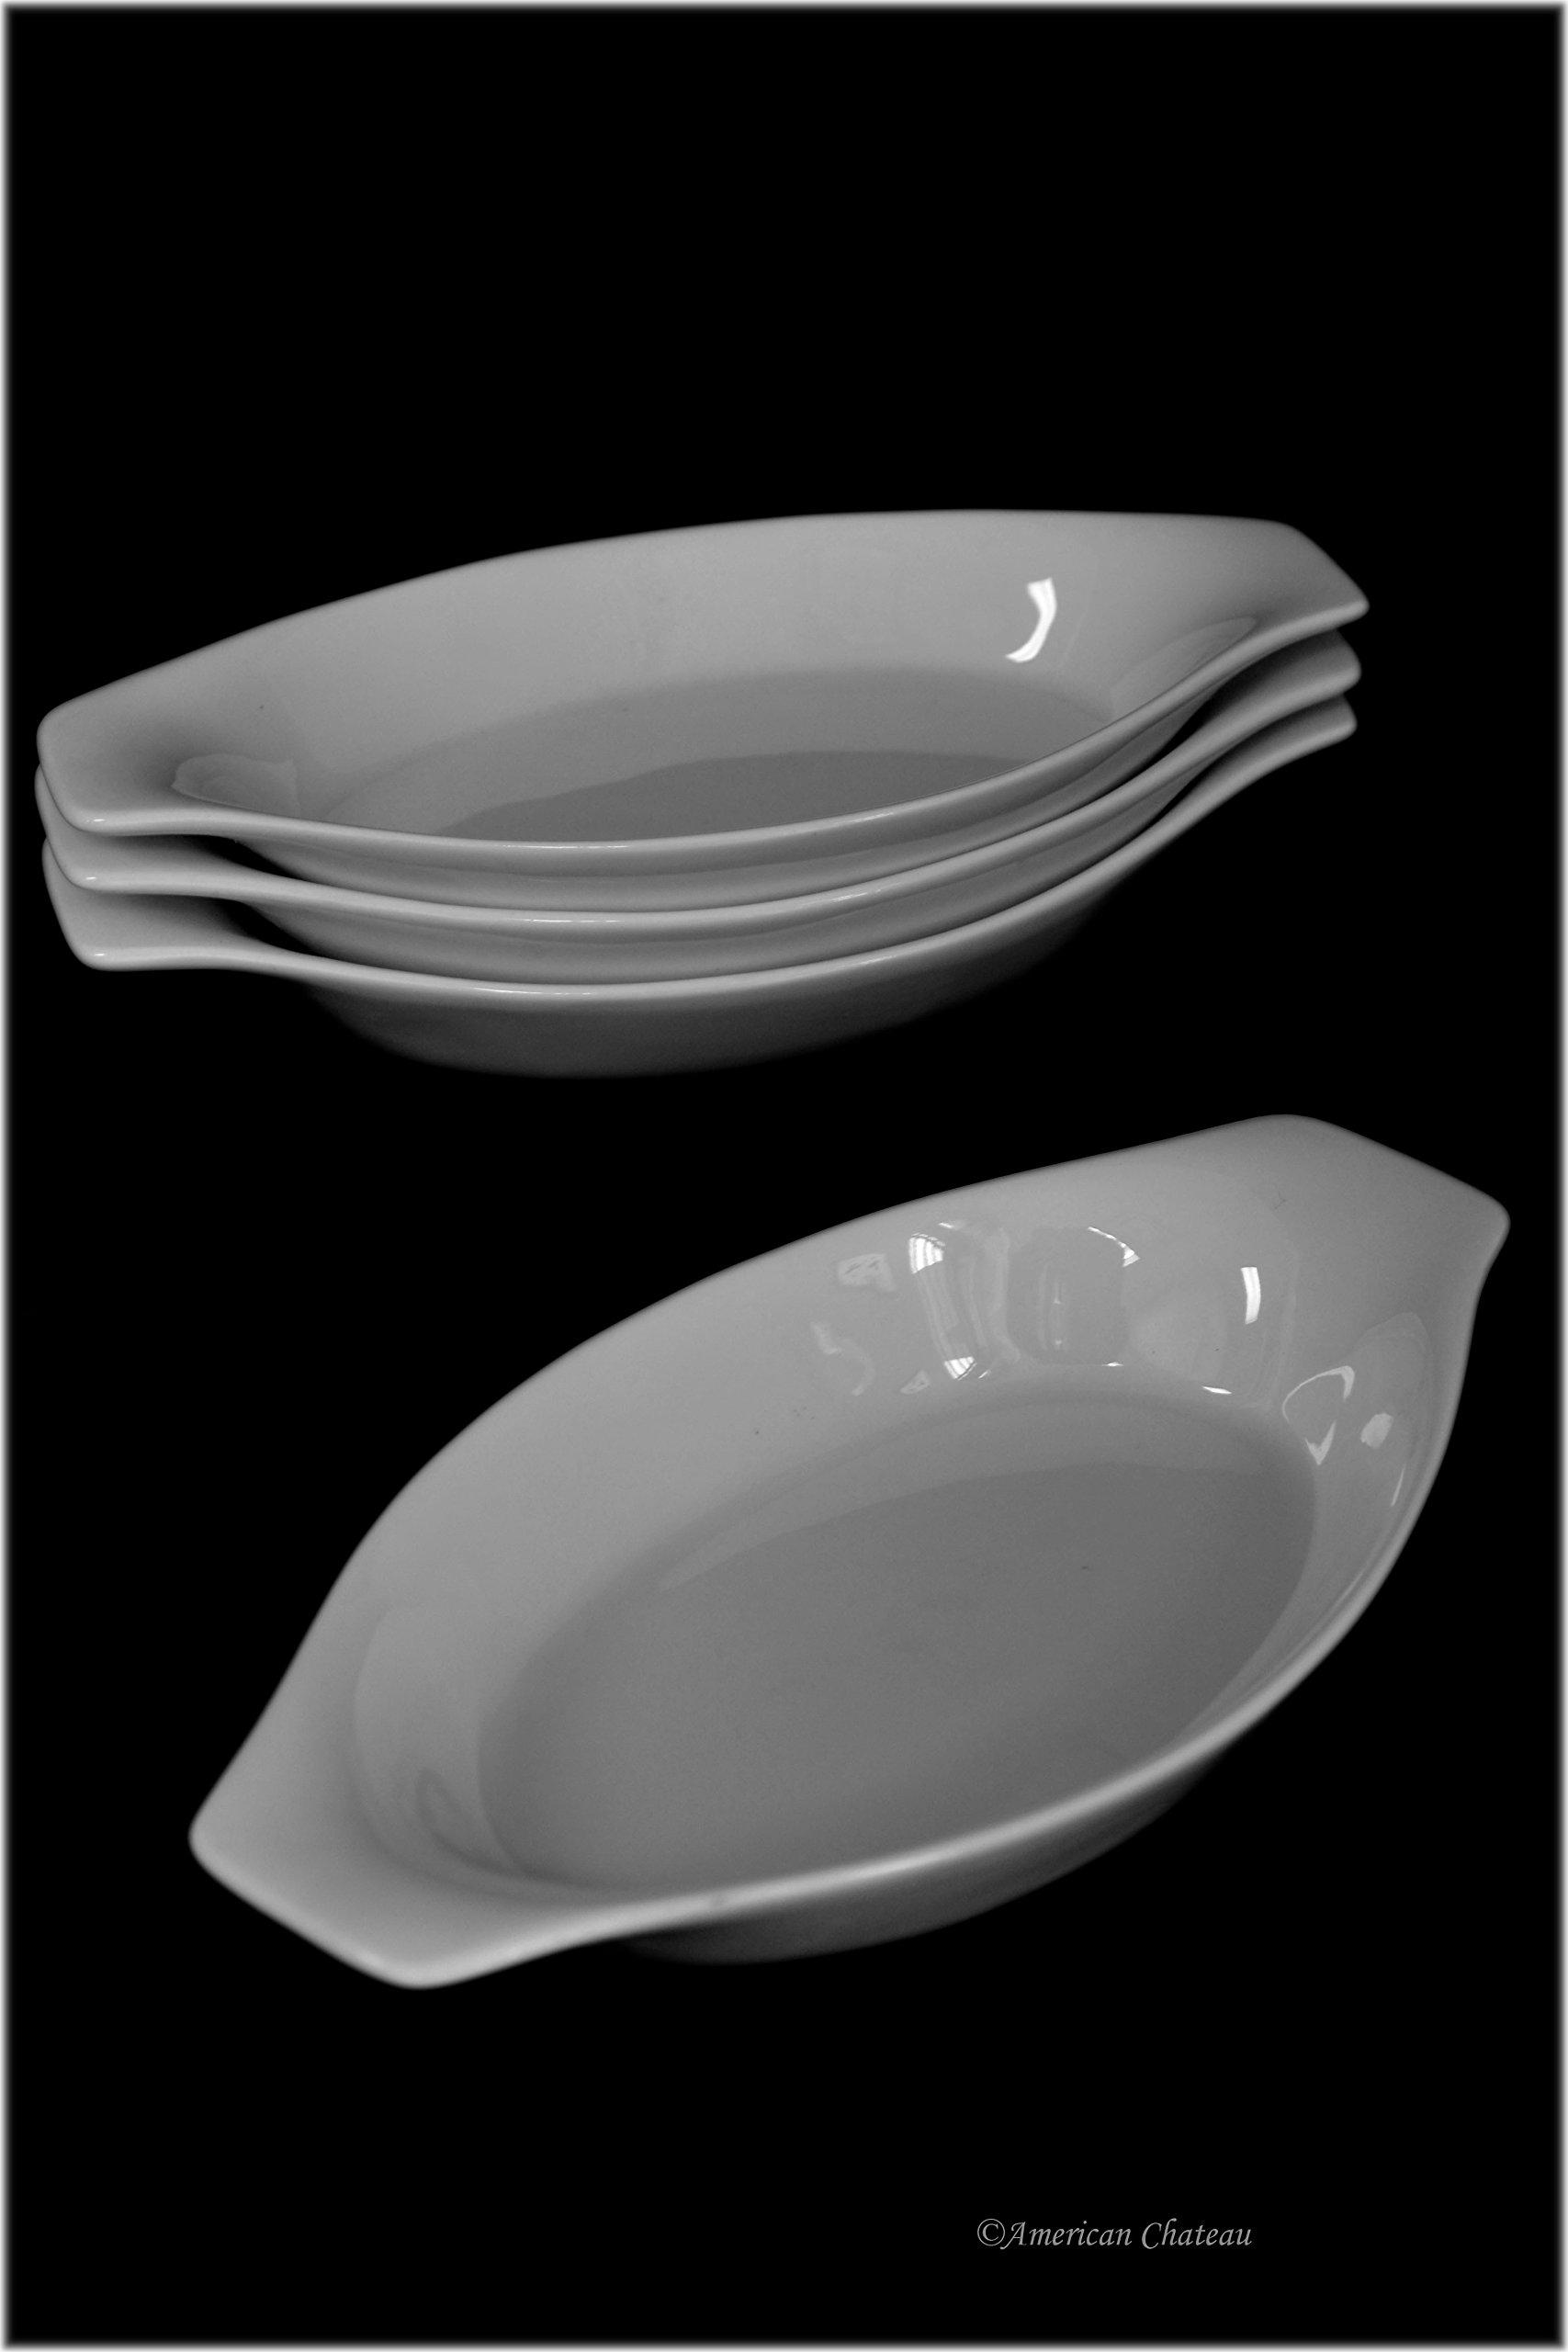 Set 4 Mini Oval Oven-Safe White Porcelain Appetizer Au Gratin Dishes with Handles